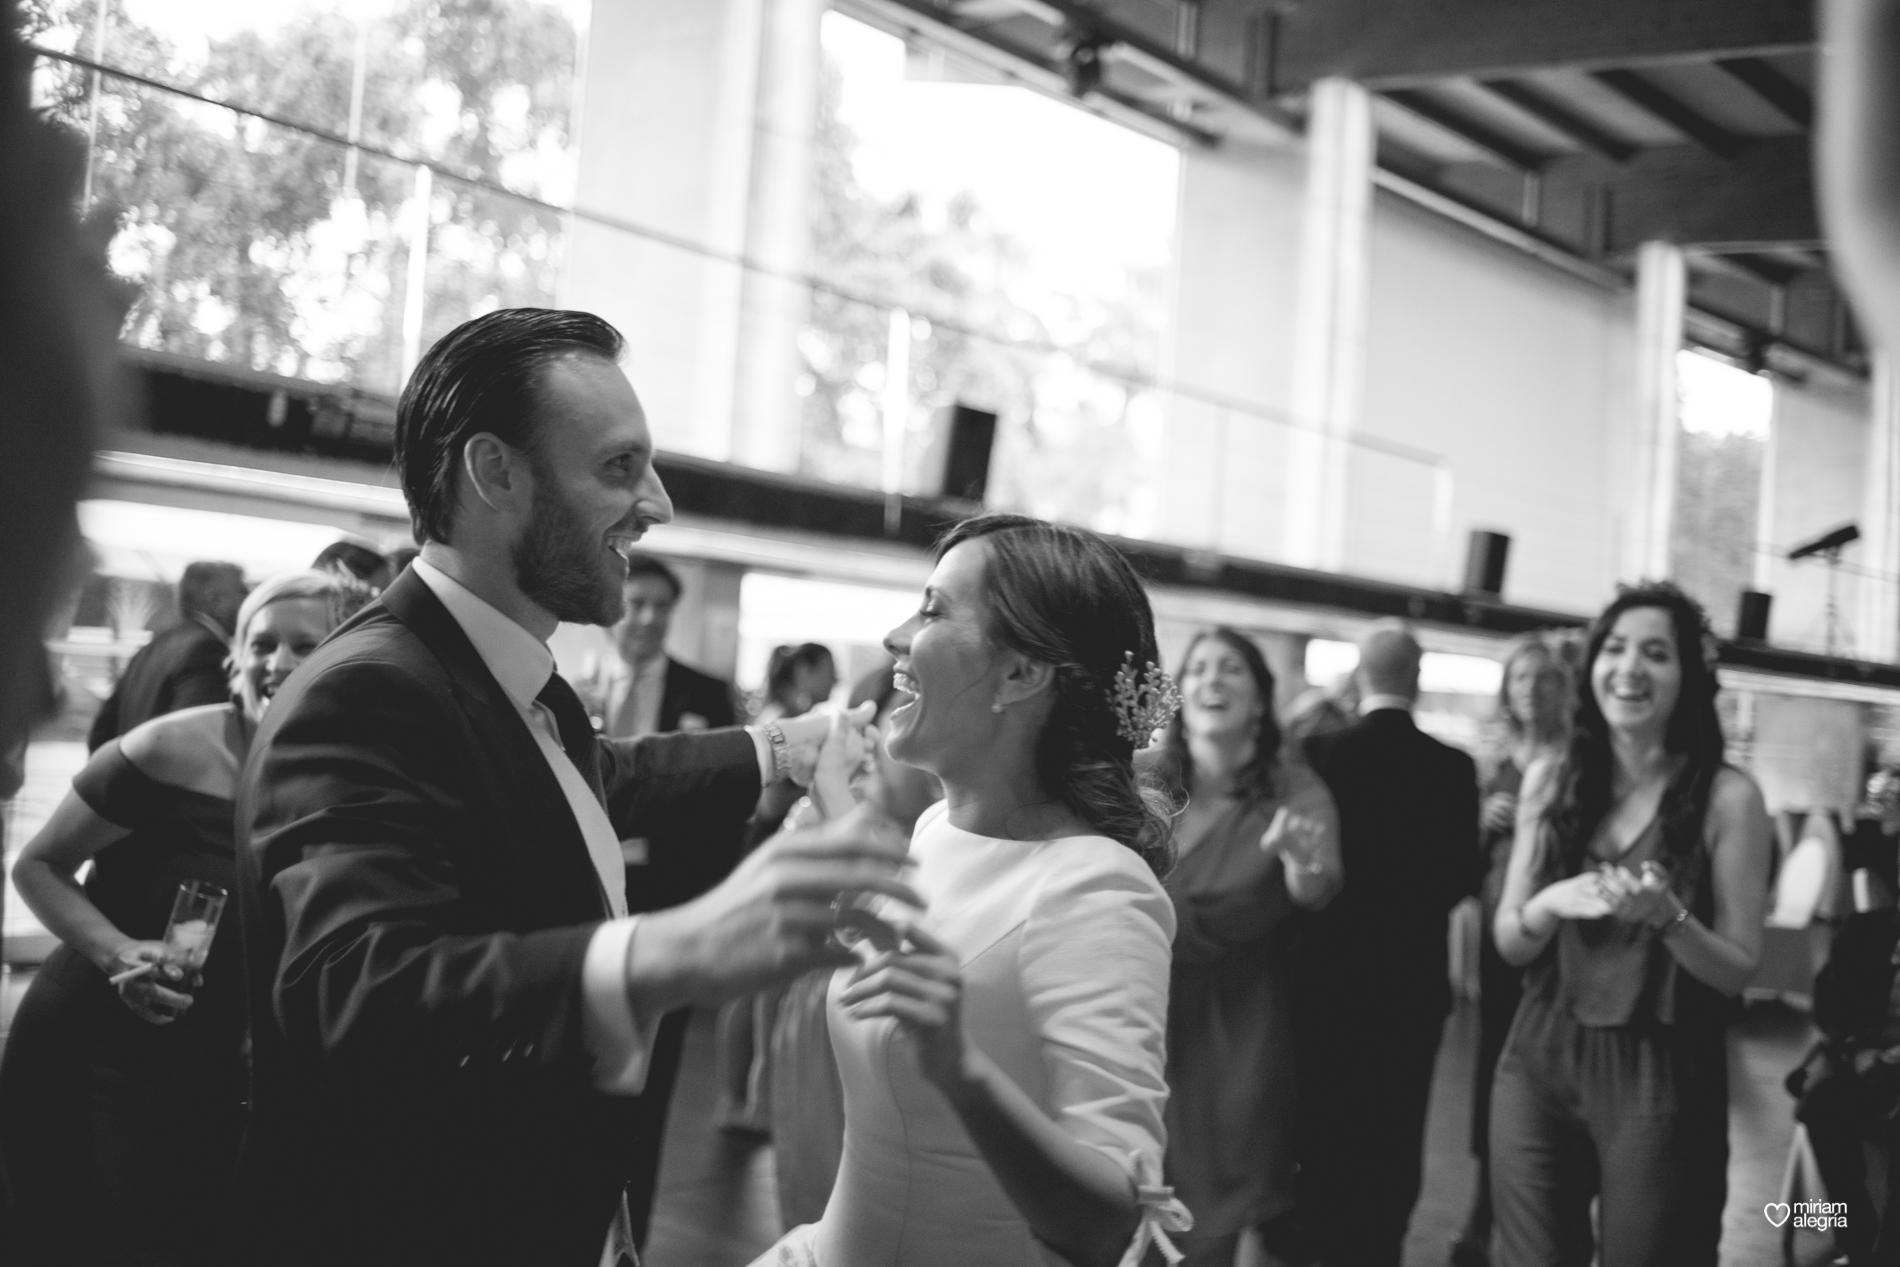 boda-en-la-catedral-de-murcia-miriam-alegria-fotografos-boda-murcia-79